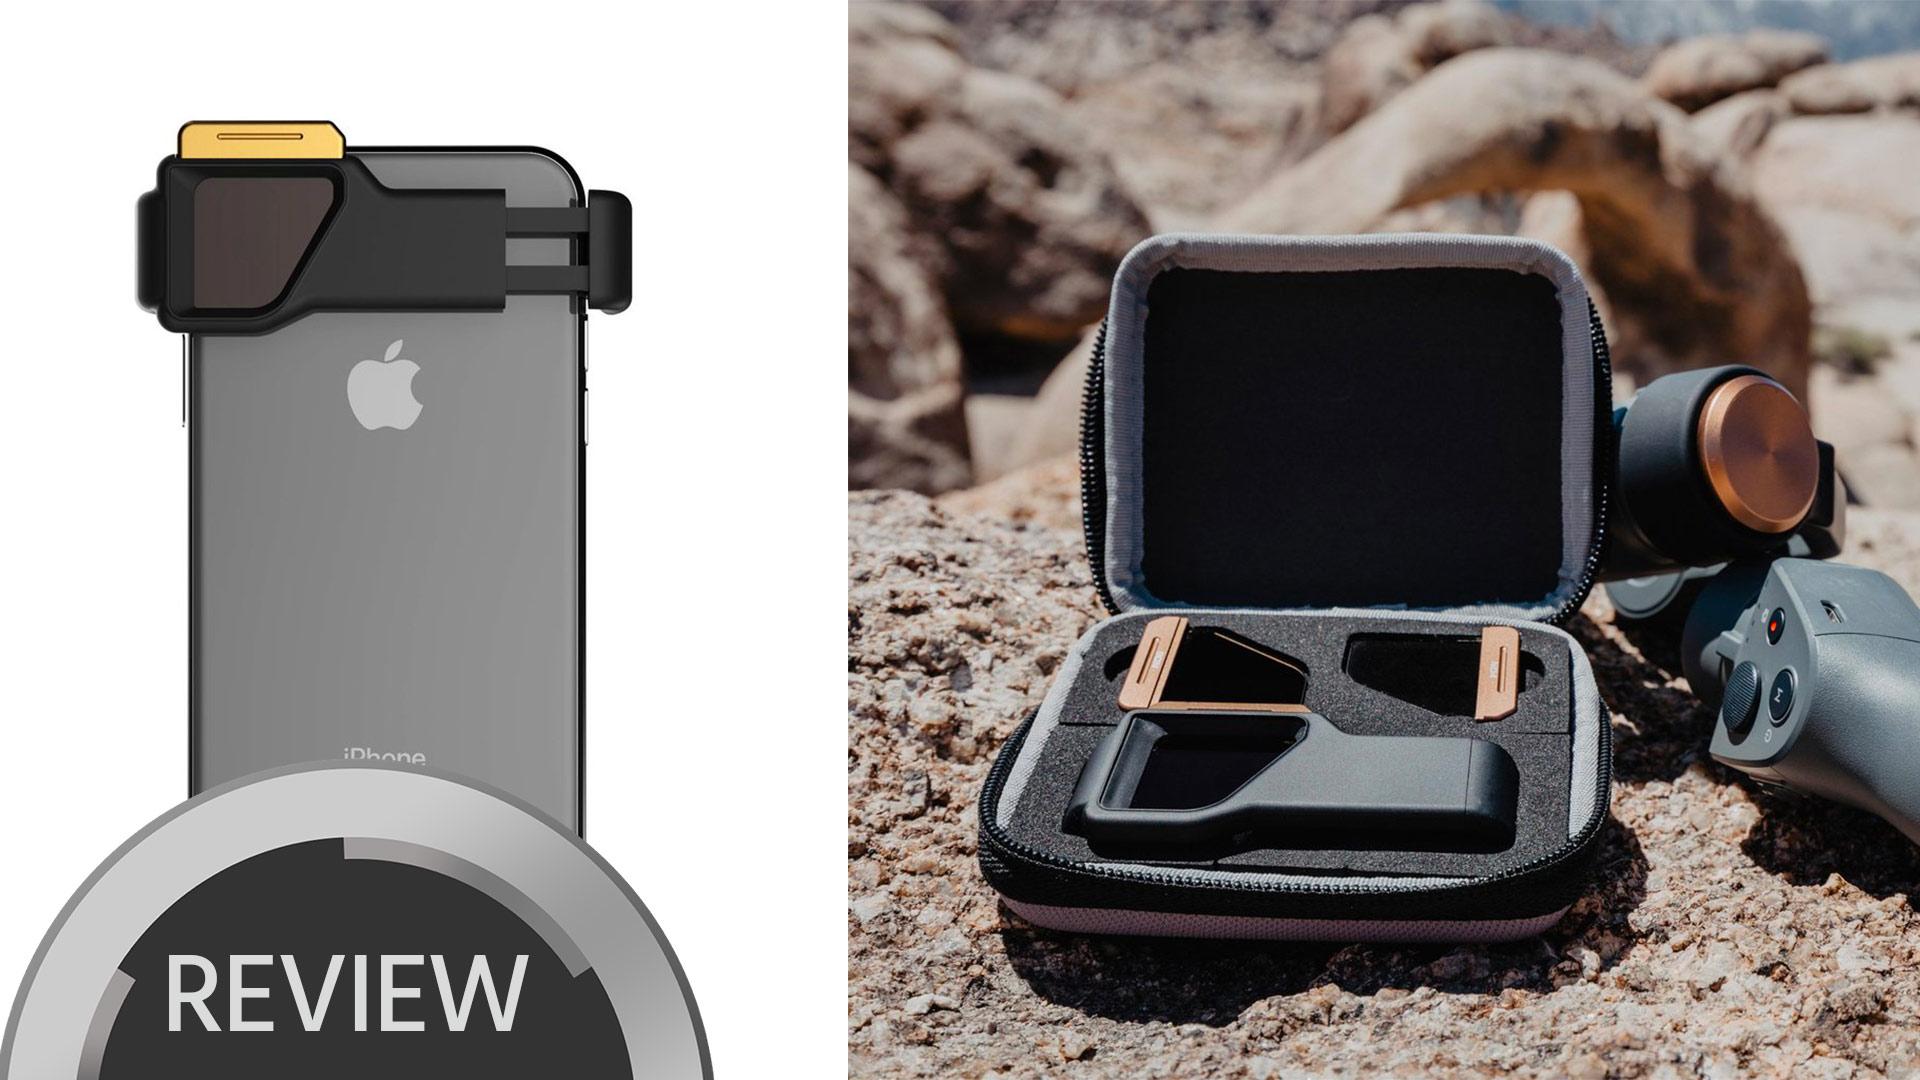 Filtros ND profesionales para tu teléfono – Nuevo sistema de filtros PolarPro Iris Mobile - Reseña